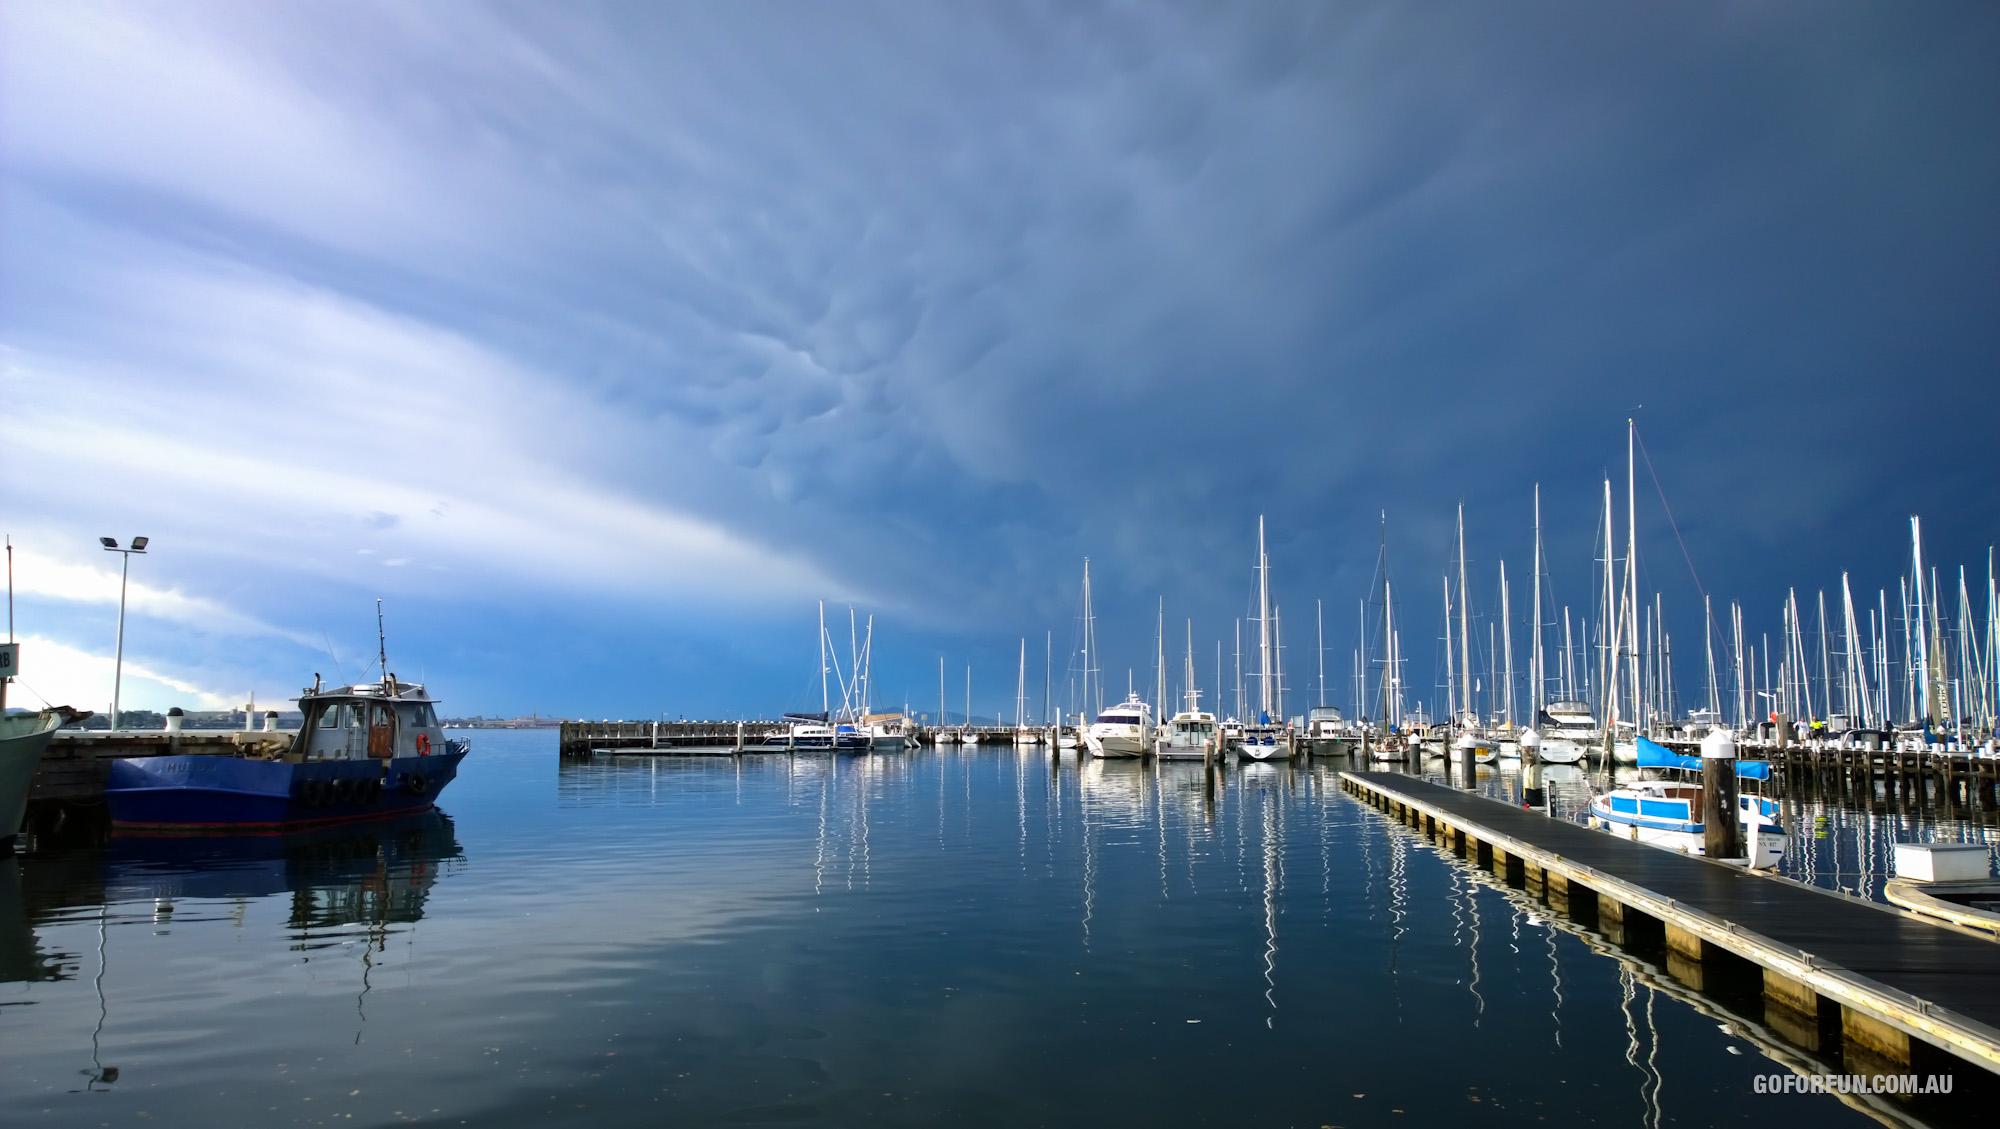 WP_20170408_16_20_45_Pro__highres_royal-geelong-yacht-club-sailing-sailboat-yacht-racing-australia-corio-bay-melbourne-victoria